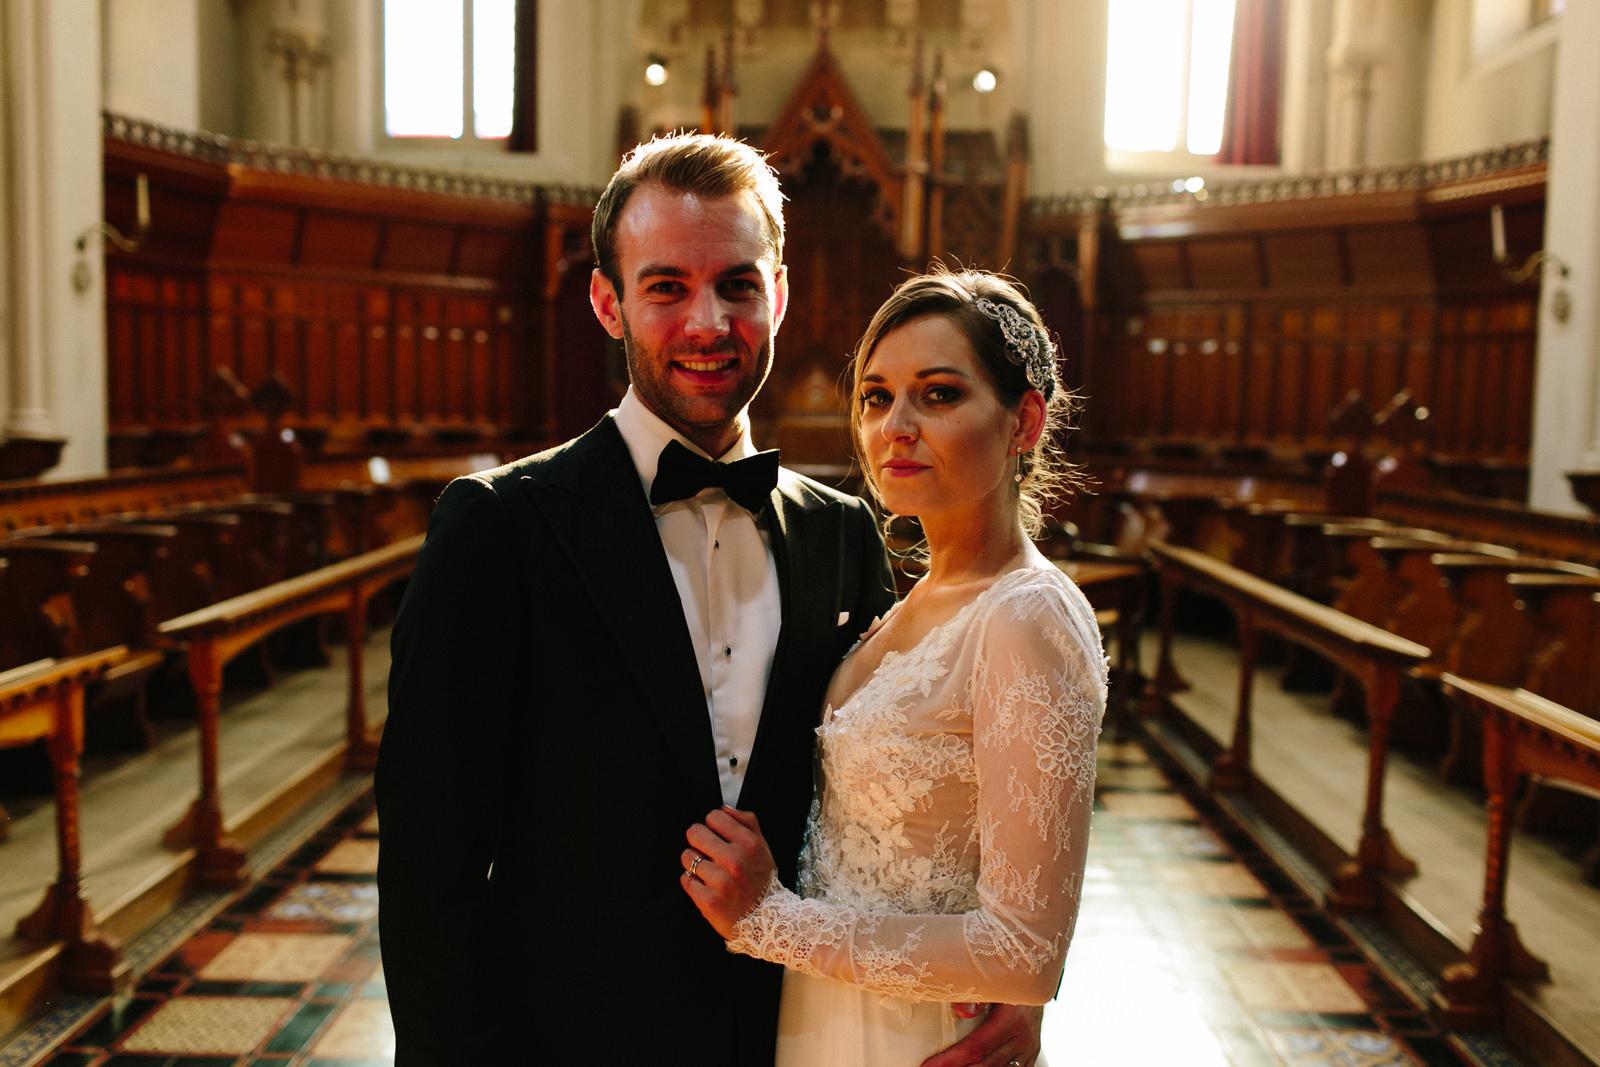 Stanbrooke Abbey Wedding Photographer-322489.jpg